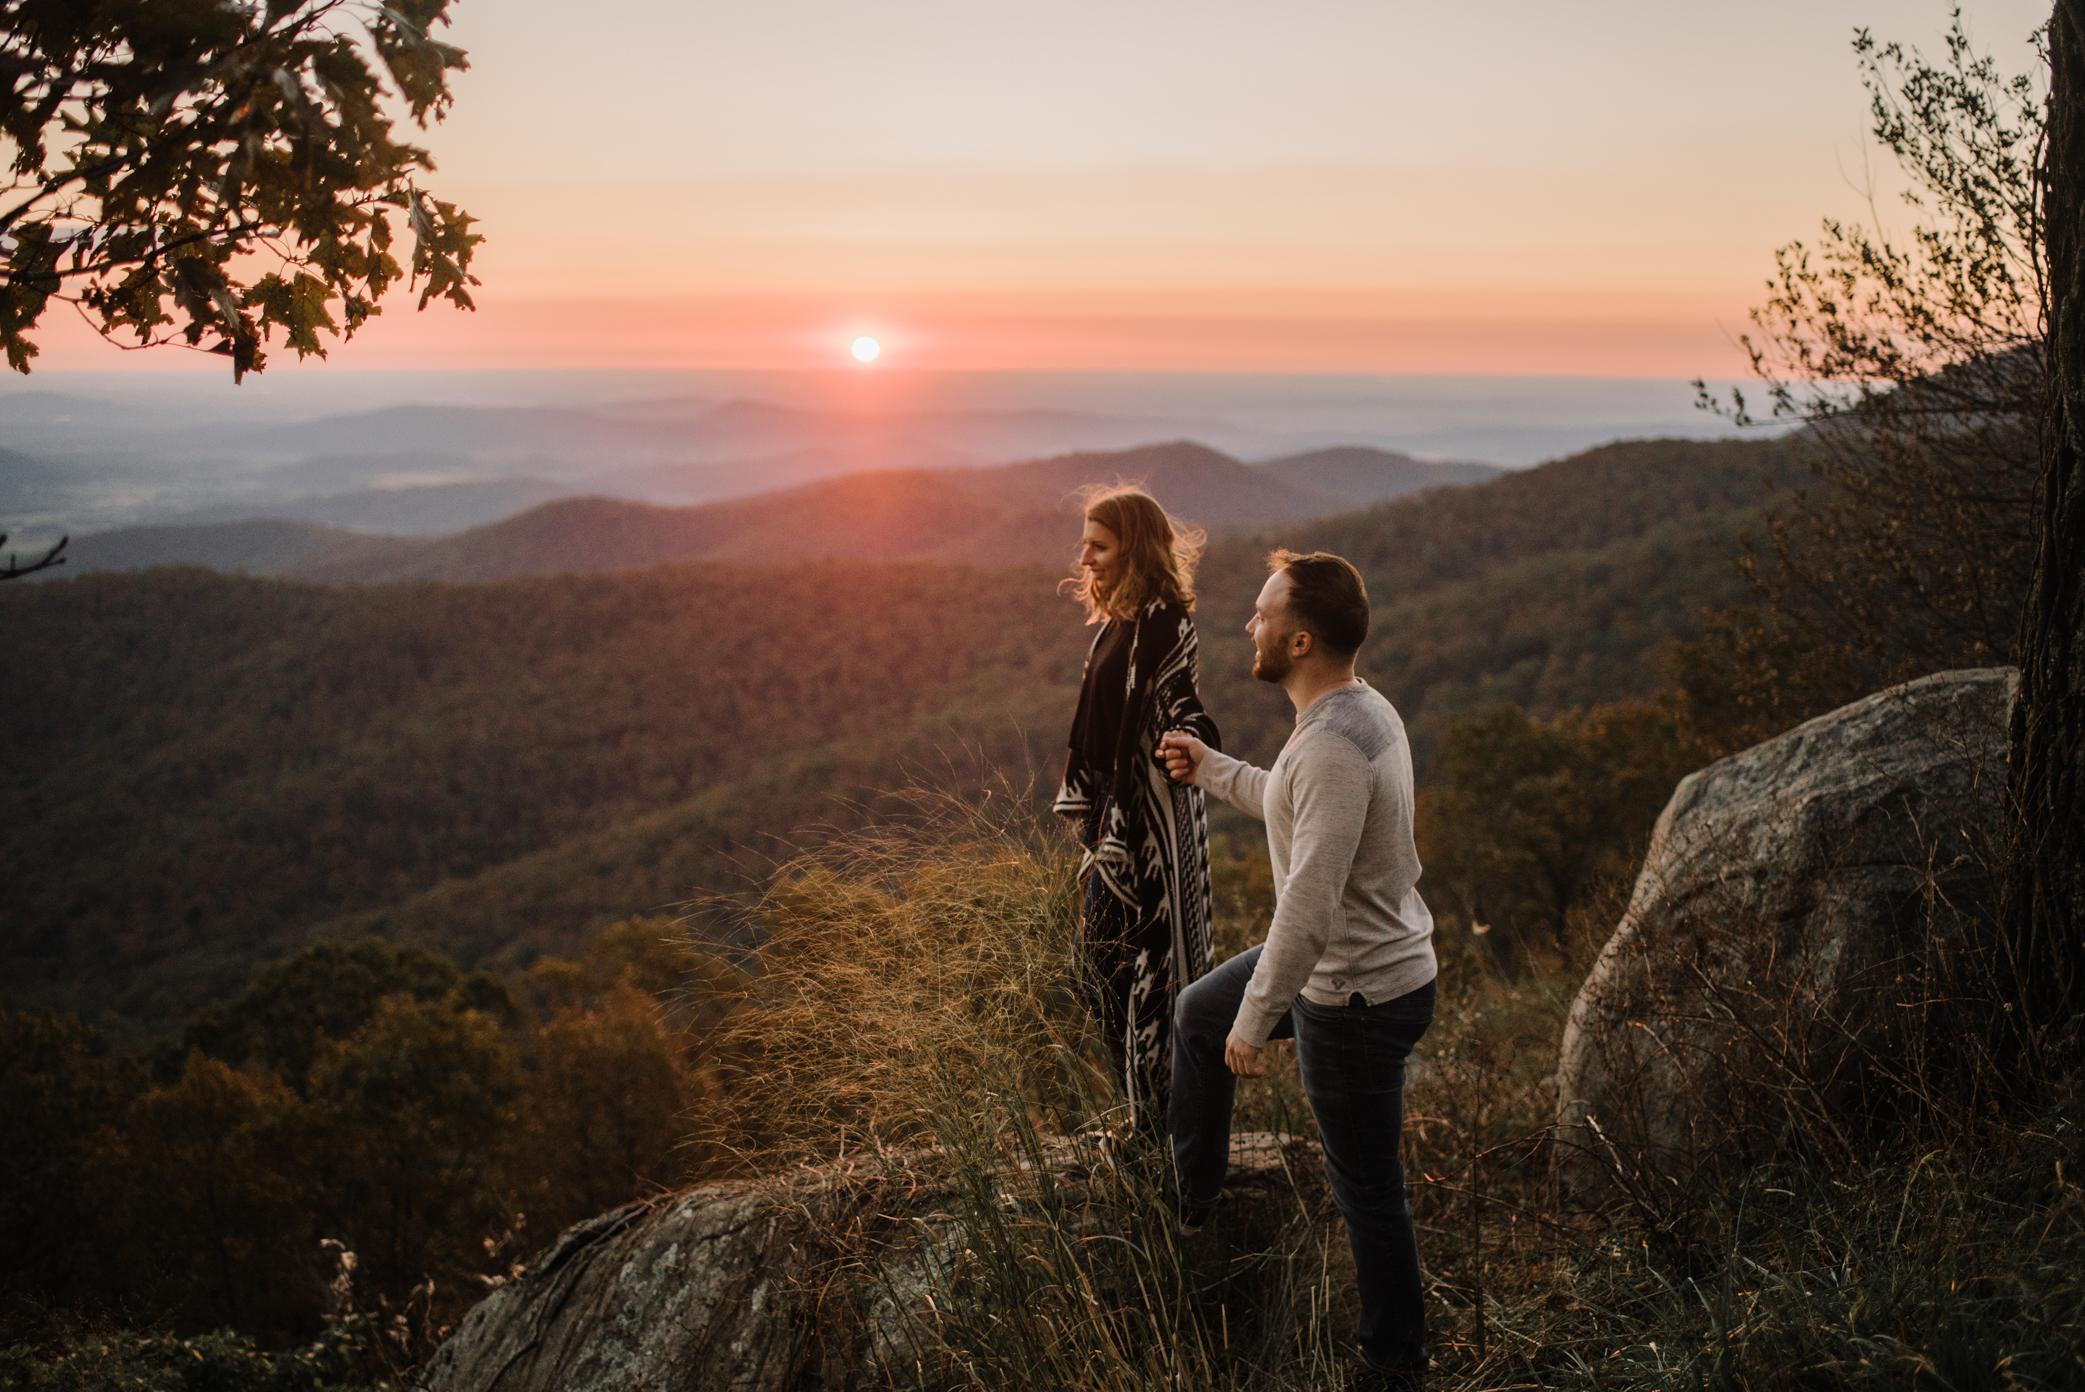 Macy and Mark - Shenandoah National Park - Fall Autumn Sunrise Couple Adventure Session - White Sails Creative - Mini Session_6.JPG